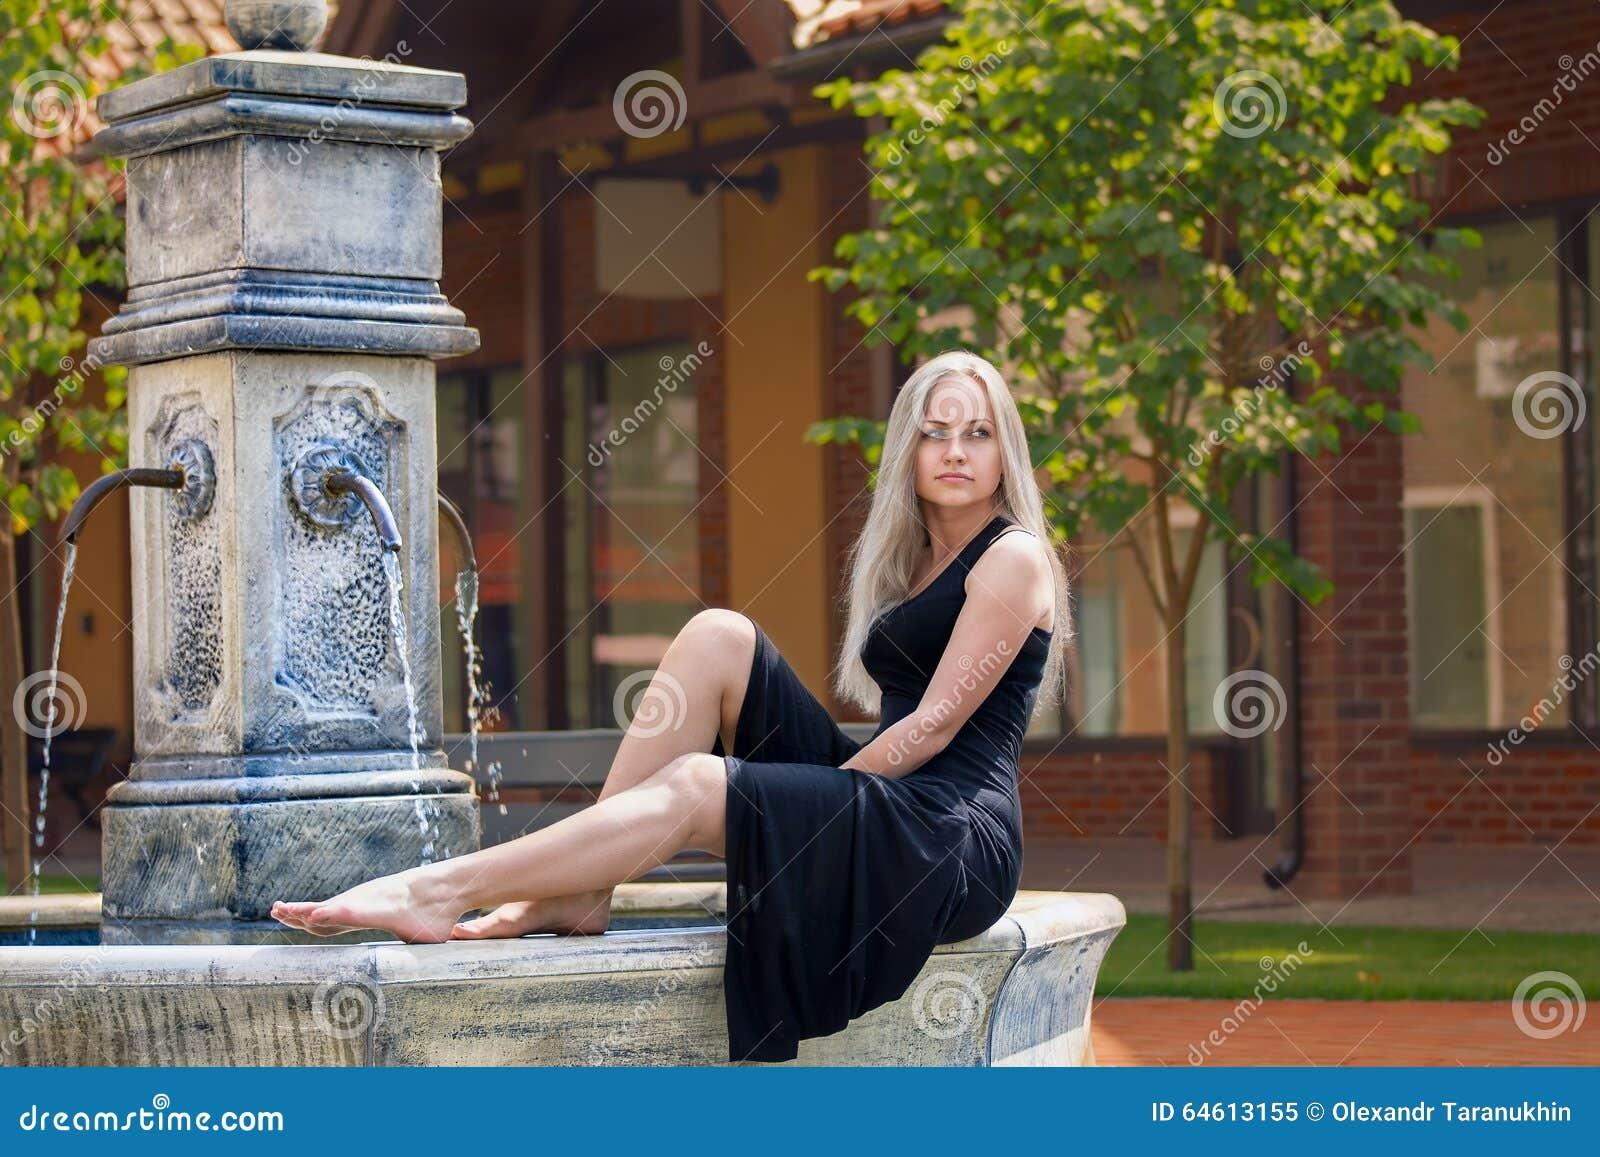 women minimalism cleavage - photo #29